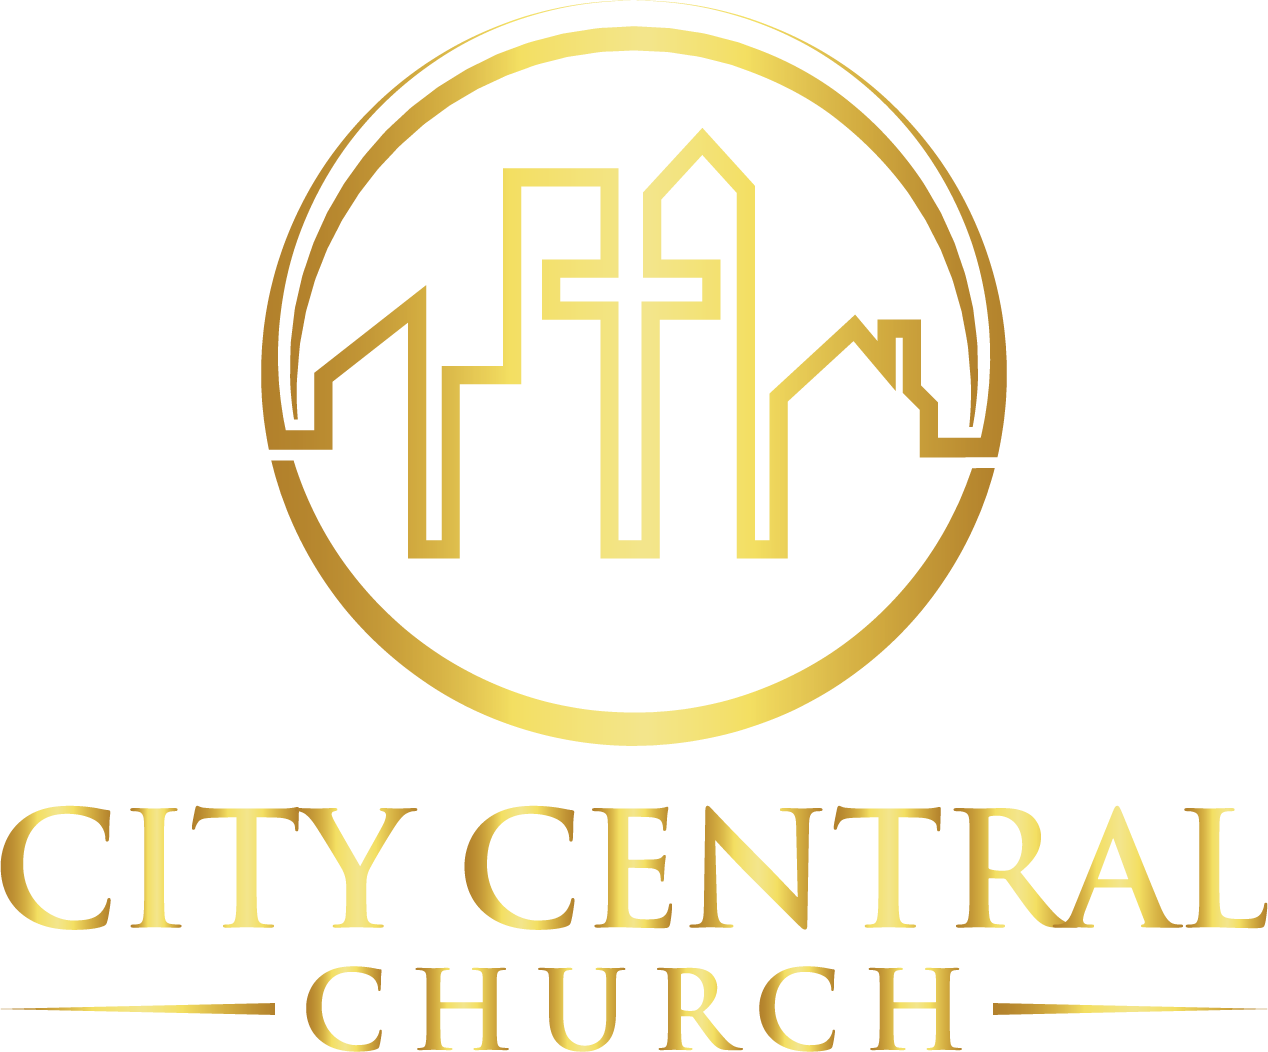 City Central Church – Lakeland Florida